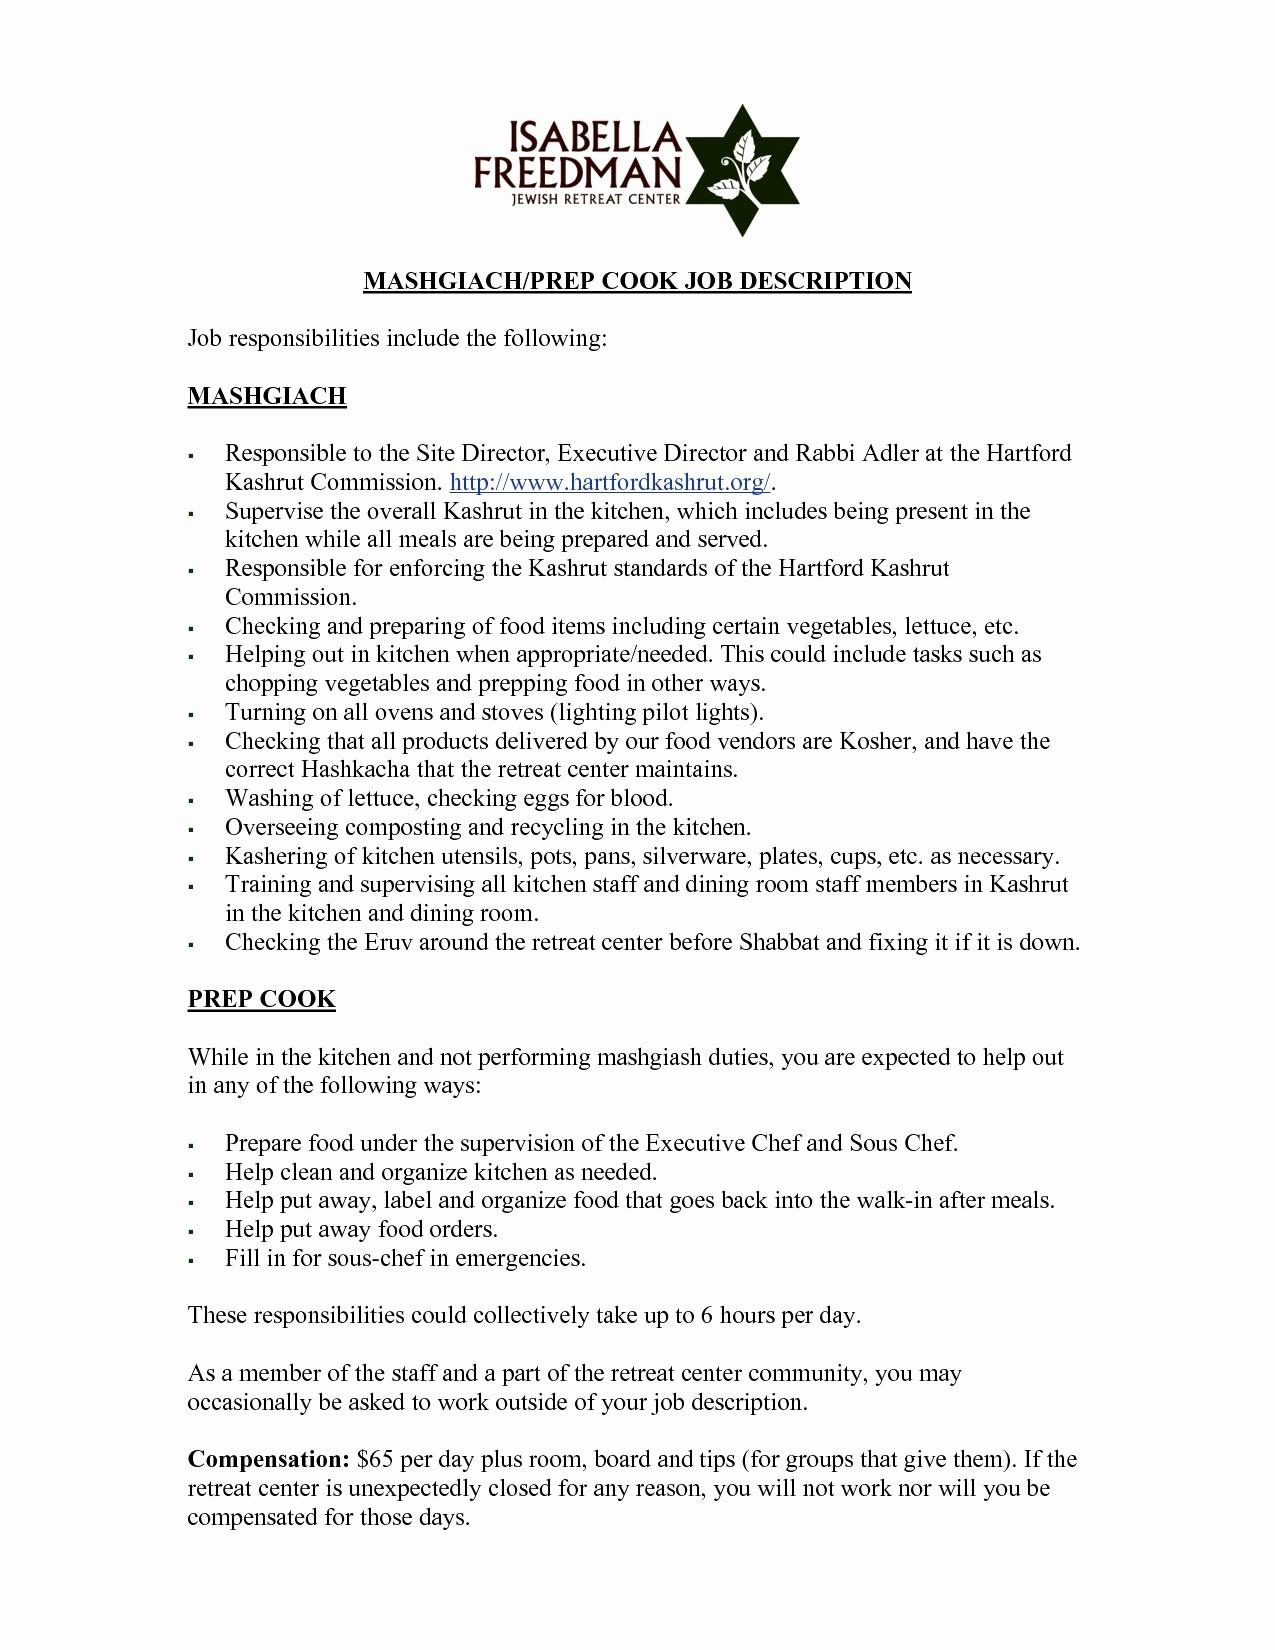 Cover Letter Template for First Job - Sample Cover Letter First Job New Best Example Resume Cover Letter